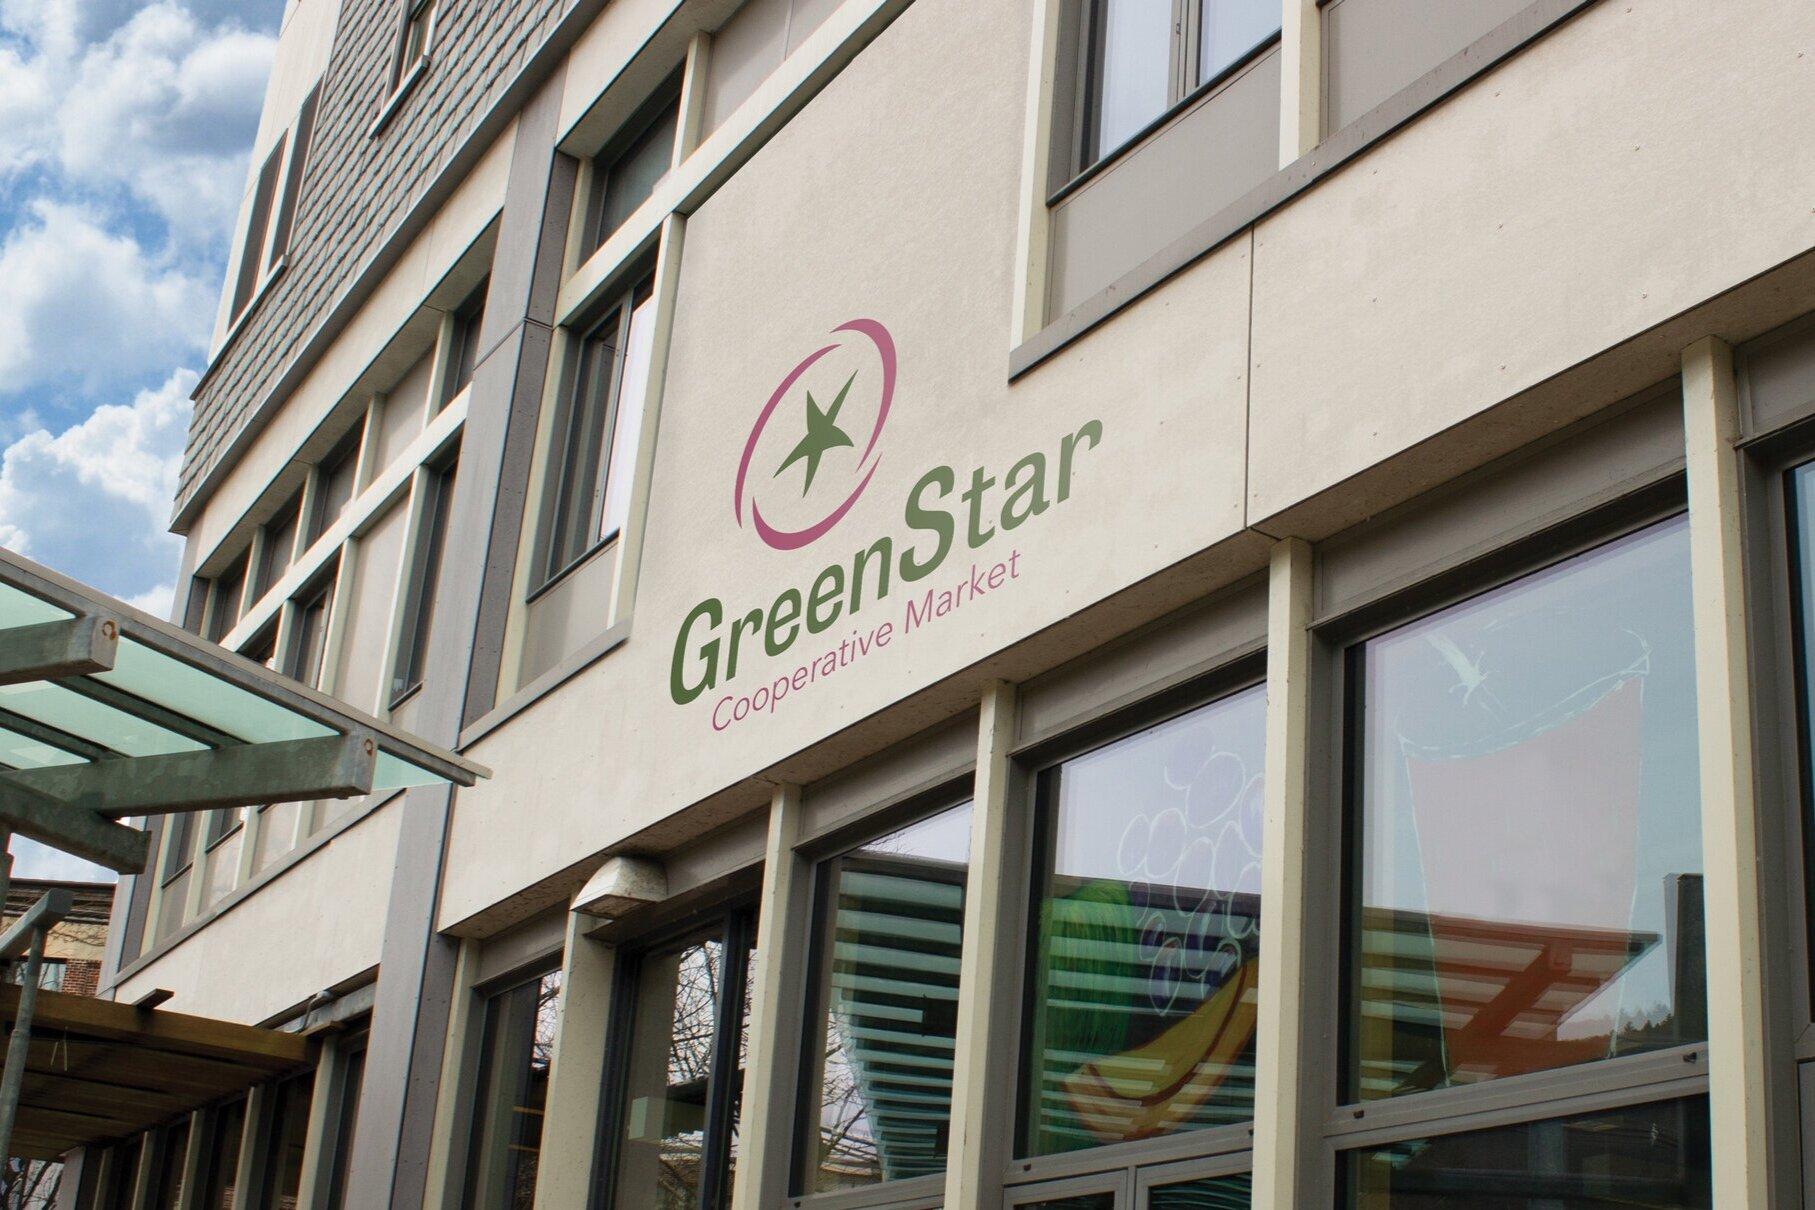 greenstar_signage_WEB.jpg